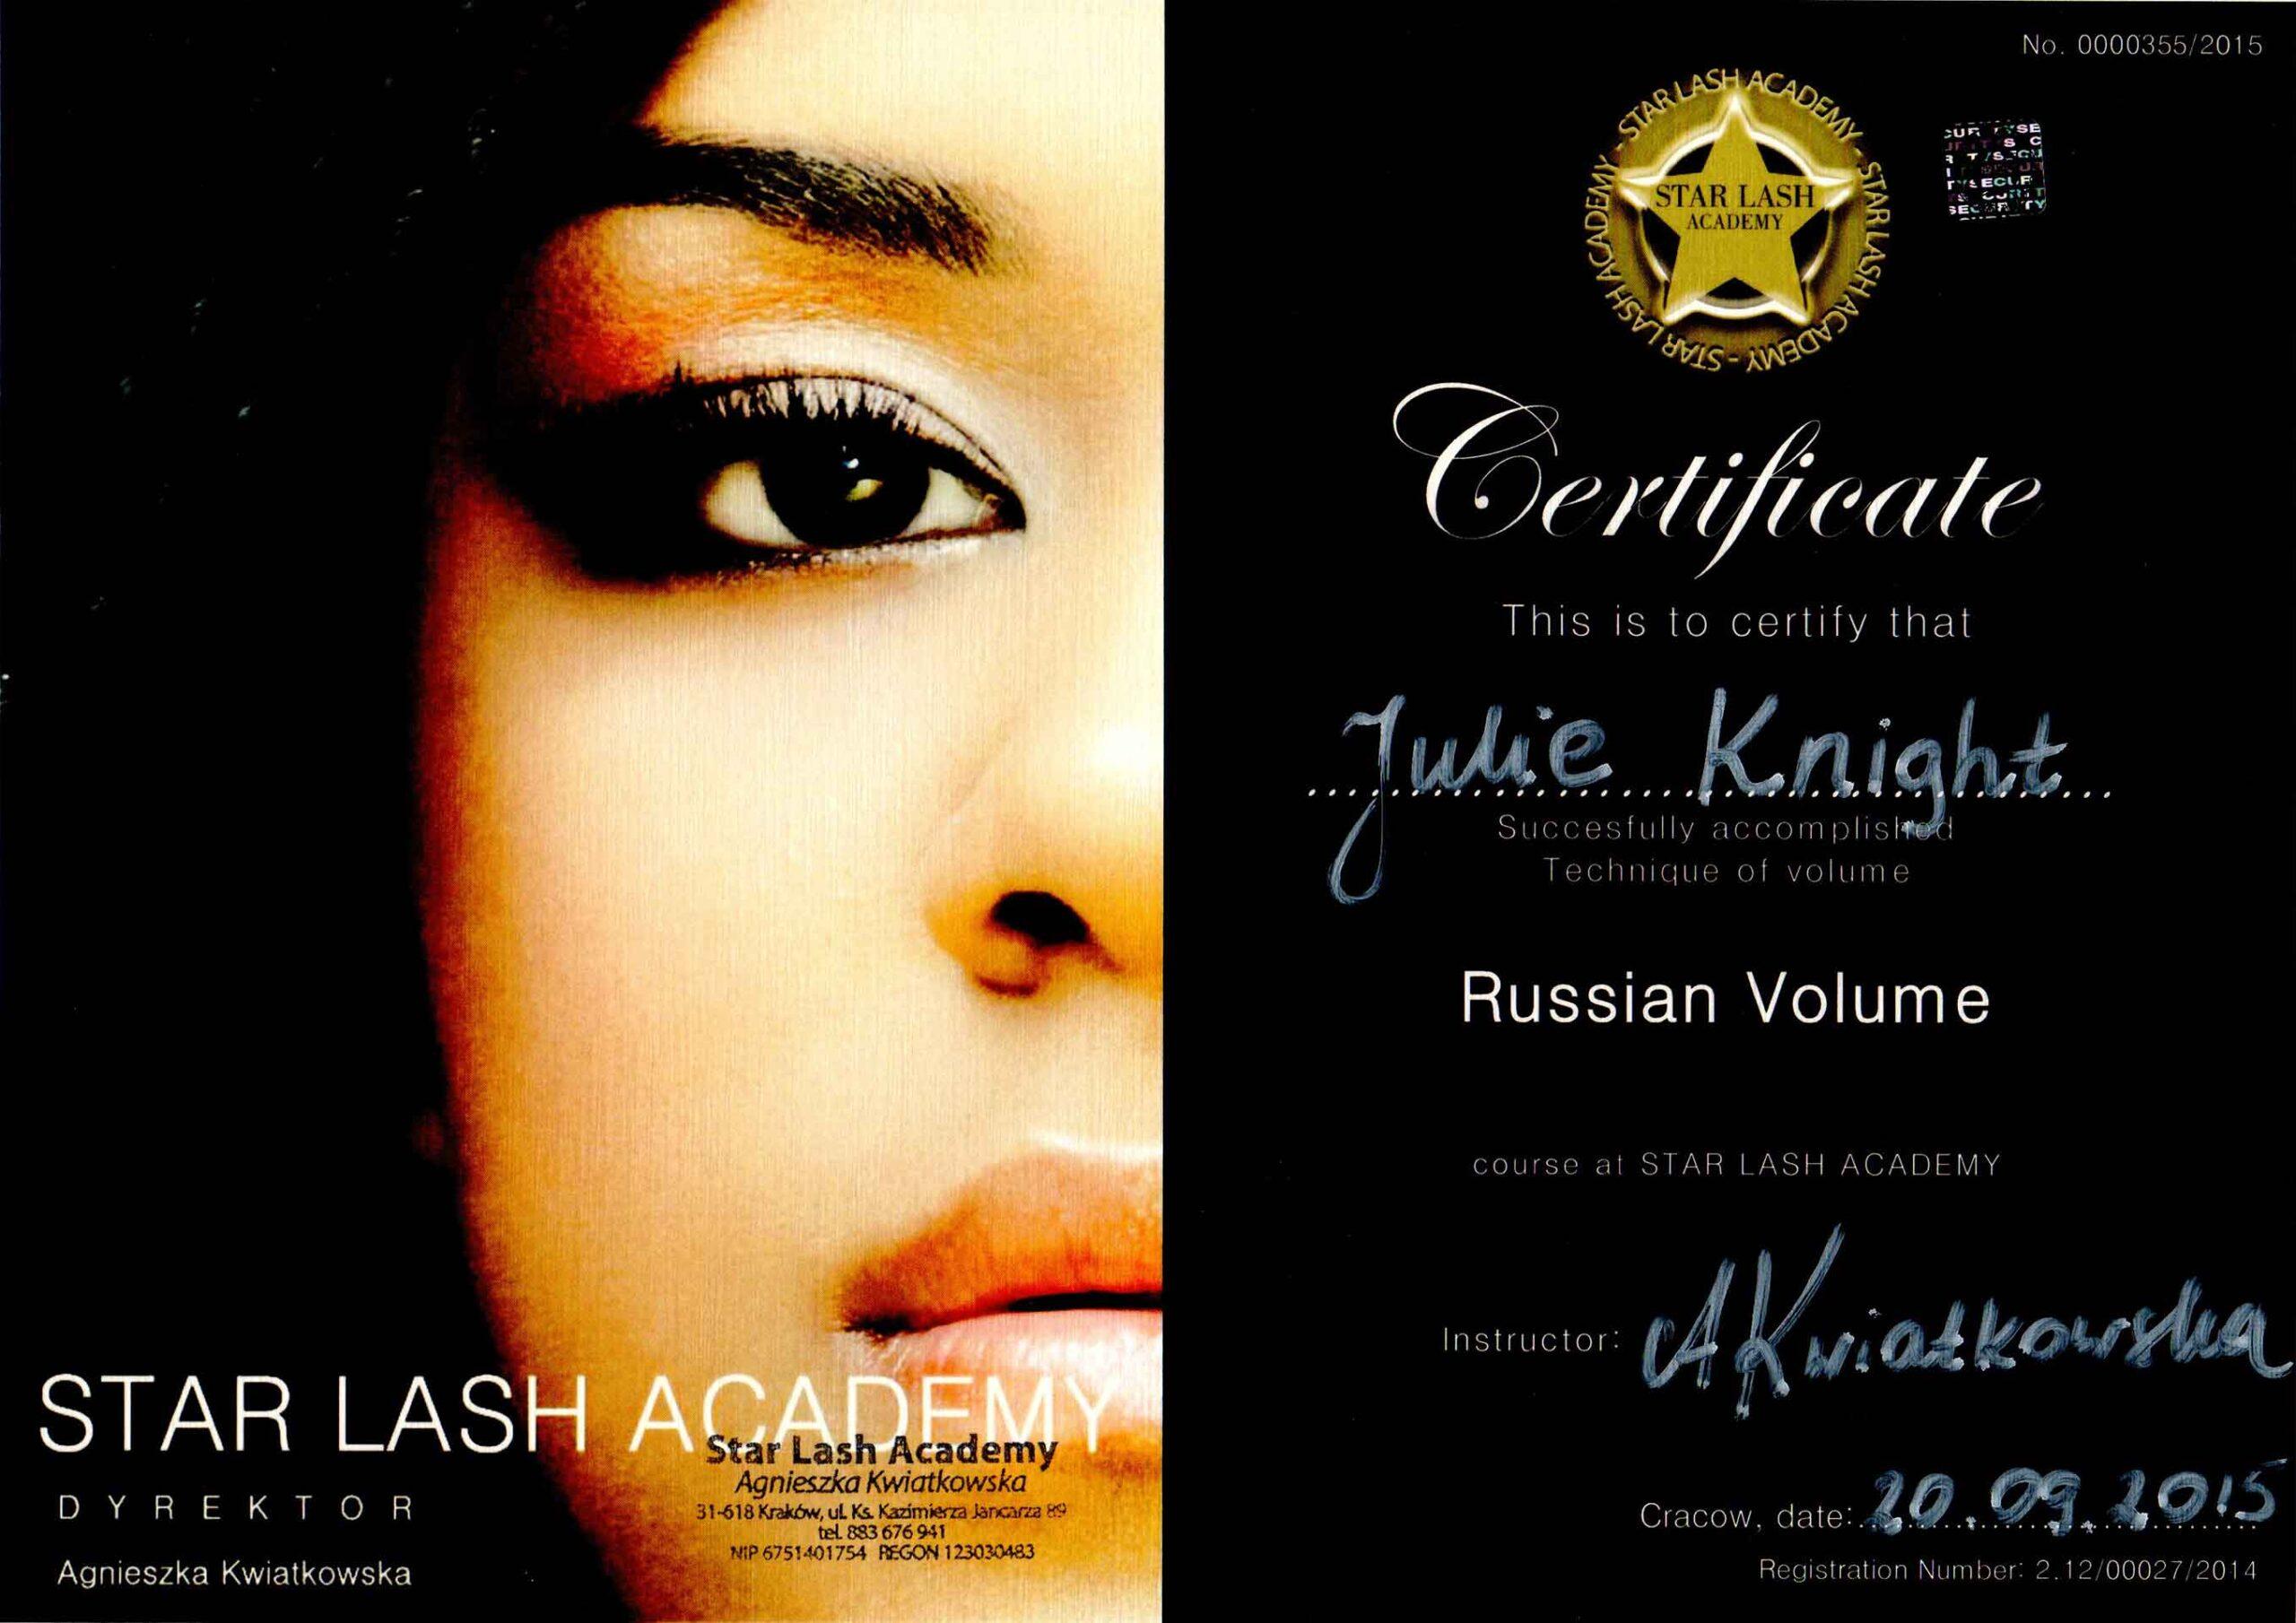 Julie-Knight-Star-Academy-Volume-Certificate